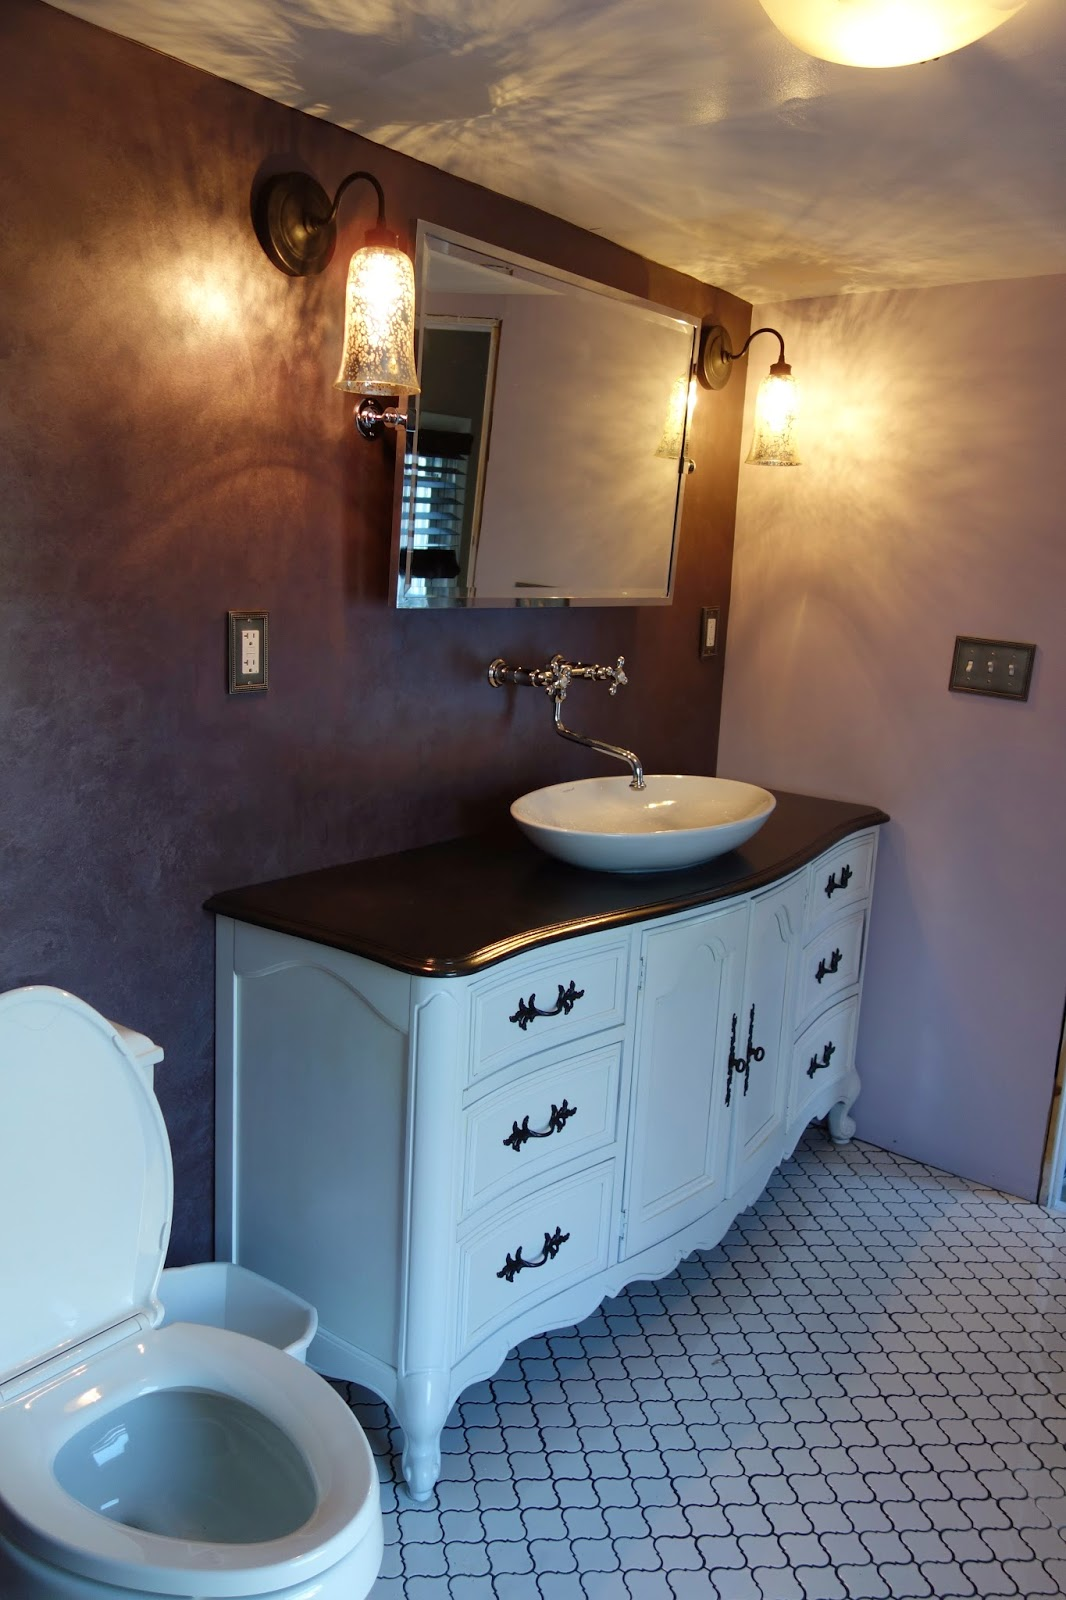 rustyfarmhouse: Bathroom Updates - Tile, Toilet, Mirror, Lights and ...